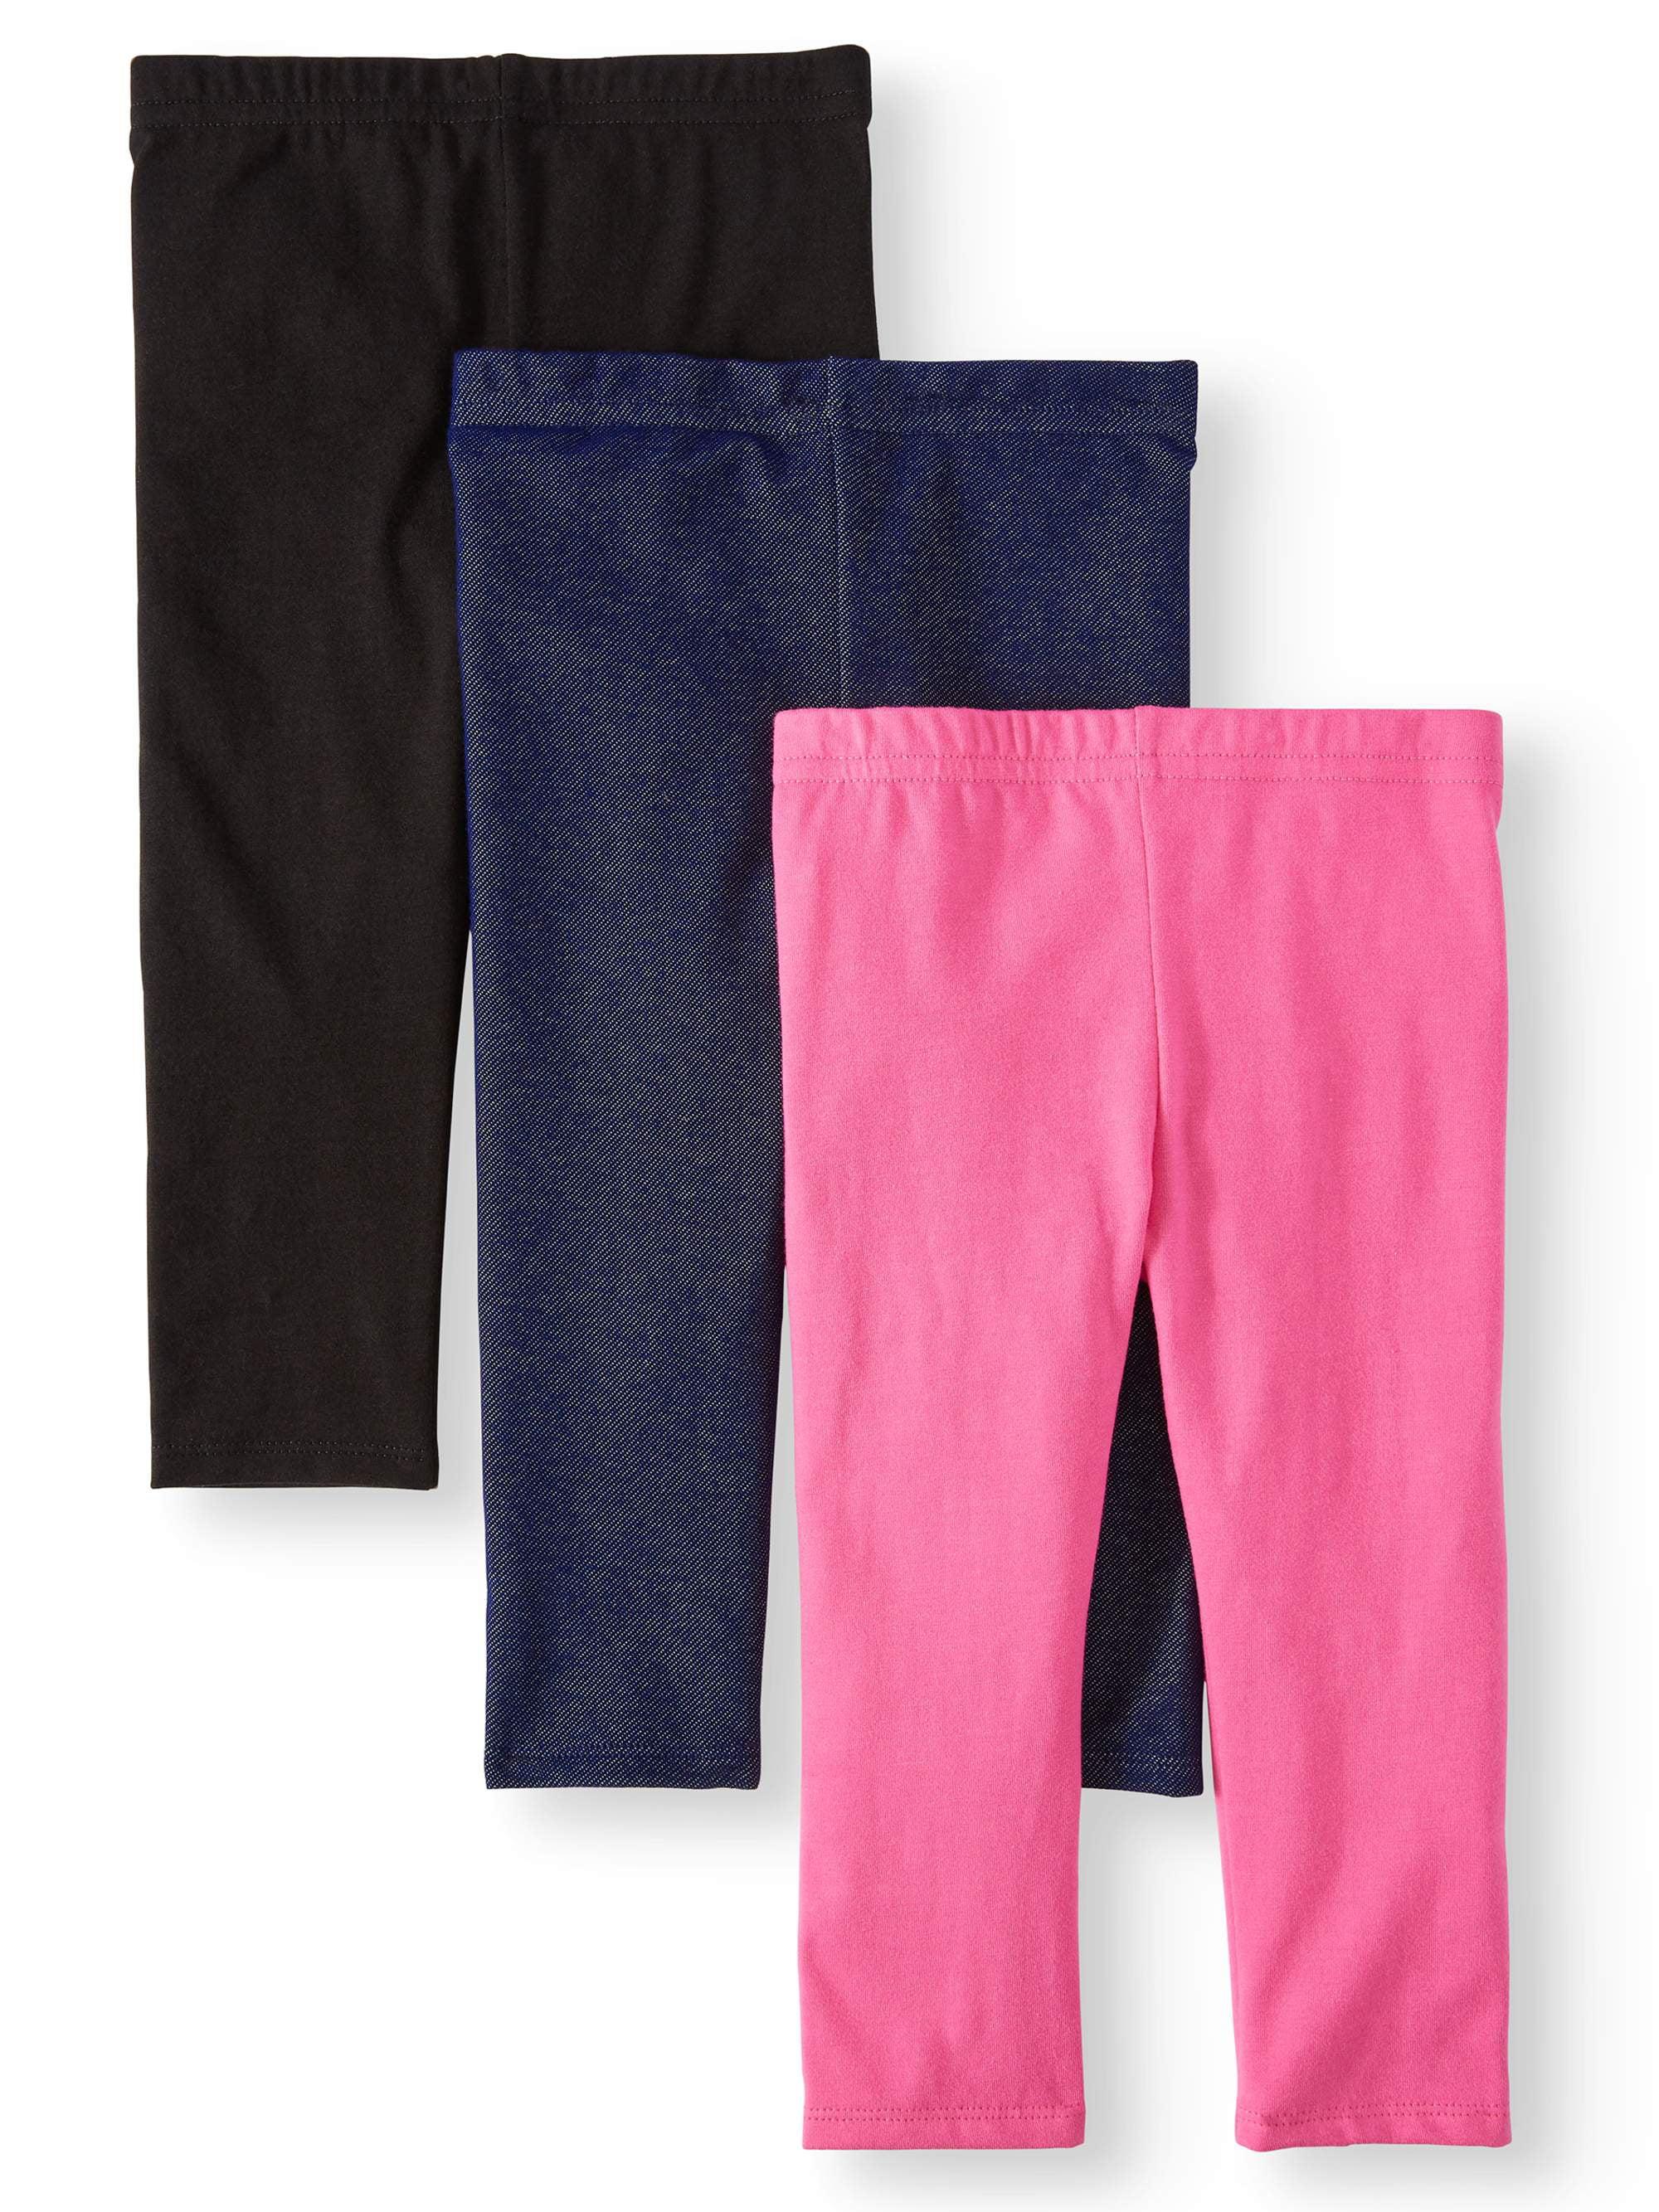 841aef21 Garanimals - Solid Capri Leggings, 3pc Multi-Pack (Toddler Girls) -  Walmart.com